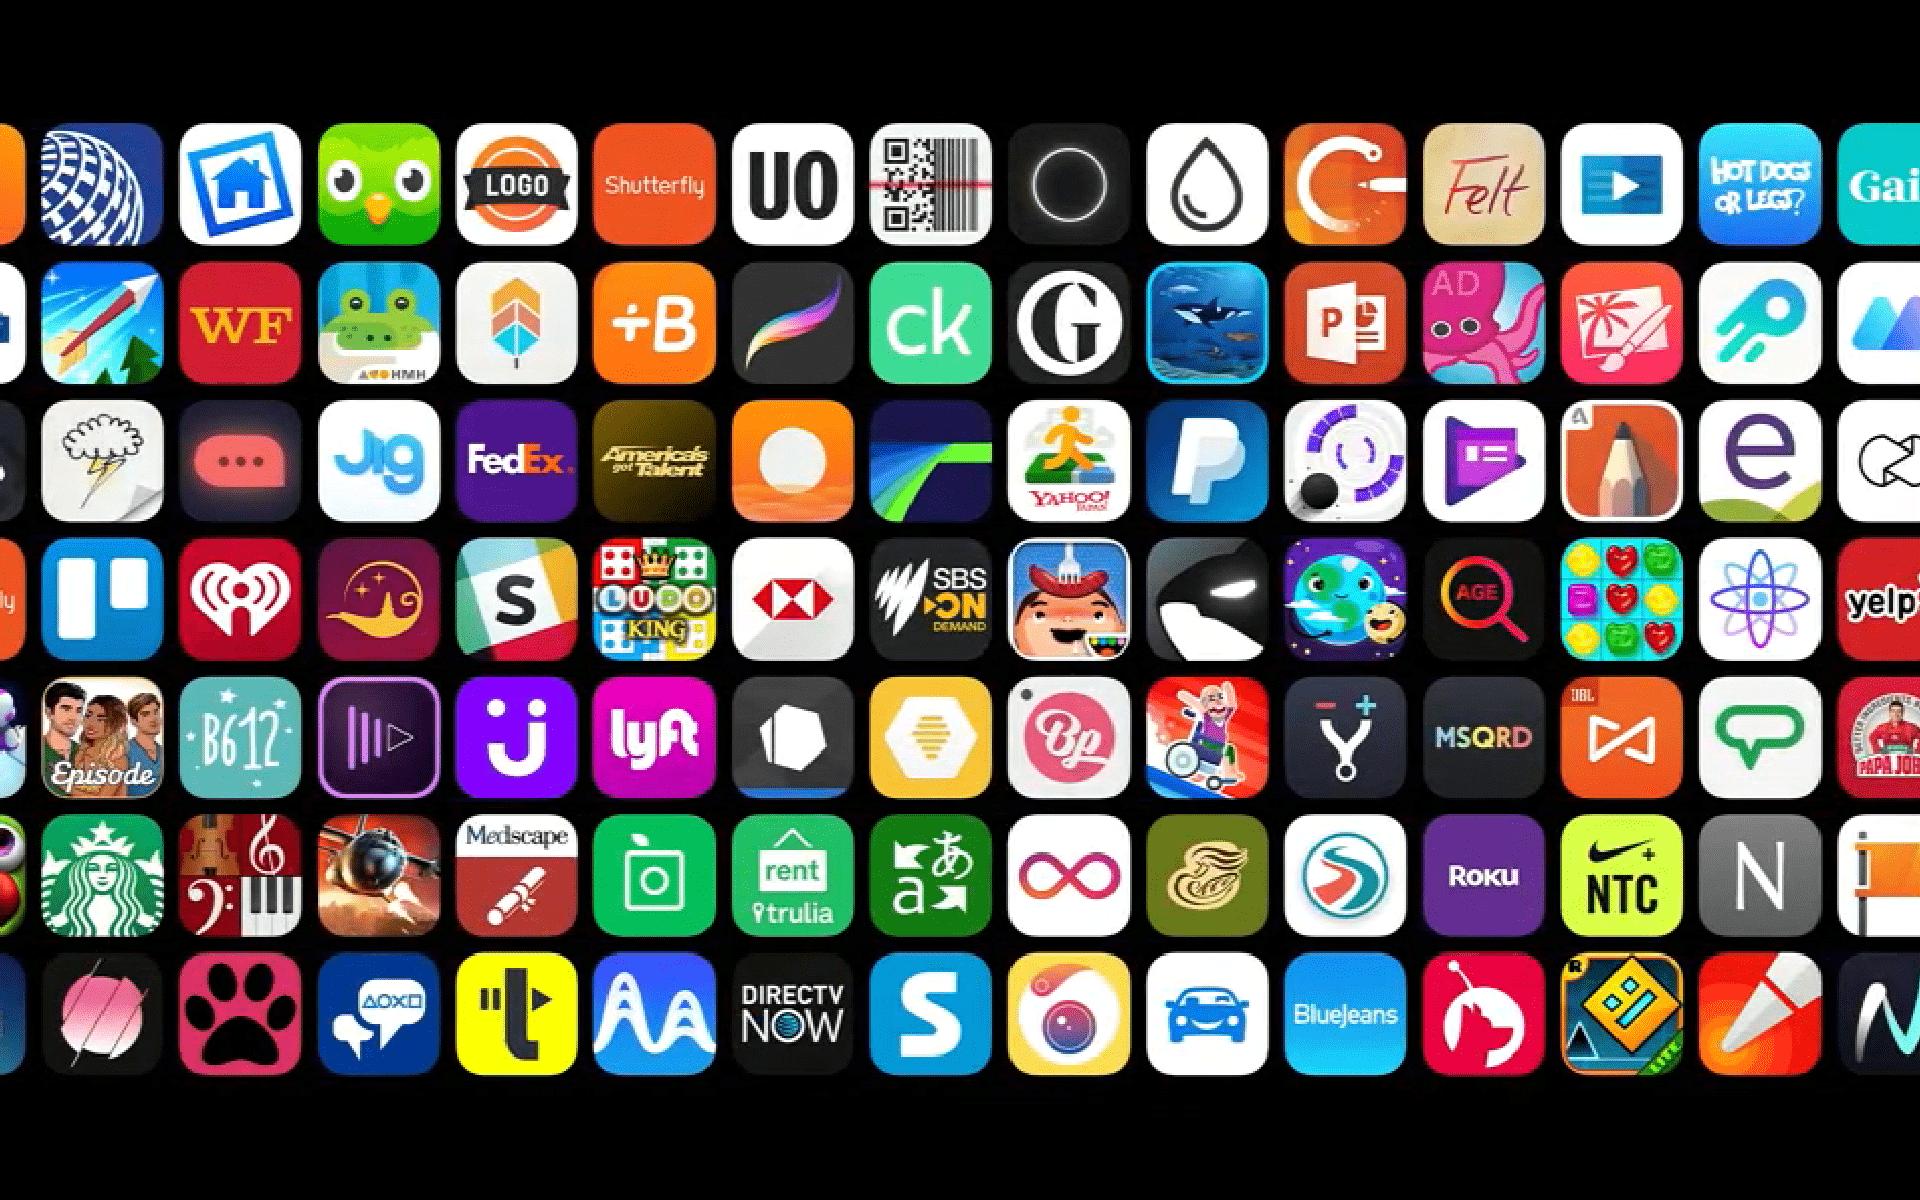 iOS 12 : notifications groupées, Animojis, Siri, tout ce qu'il faut retenir de la WWDC 2018